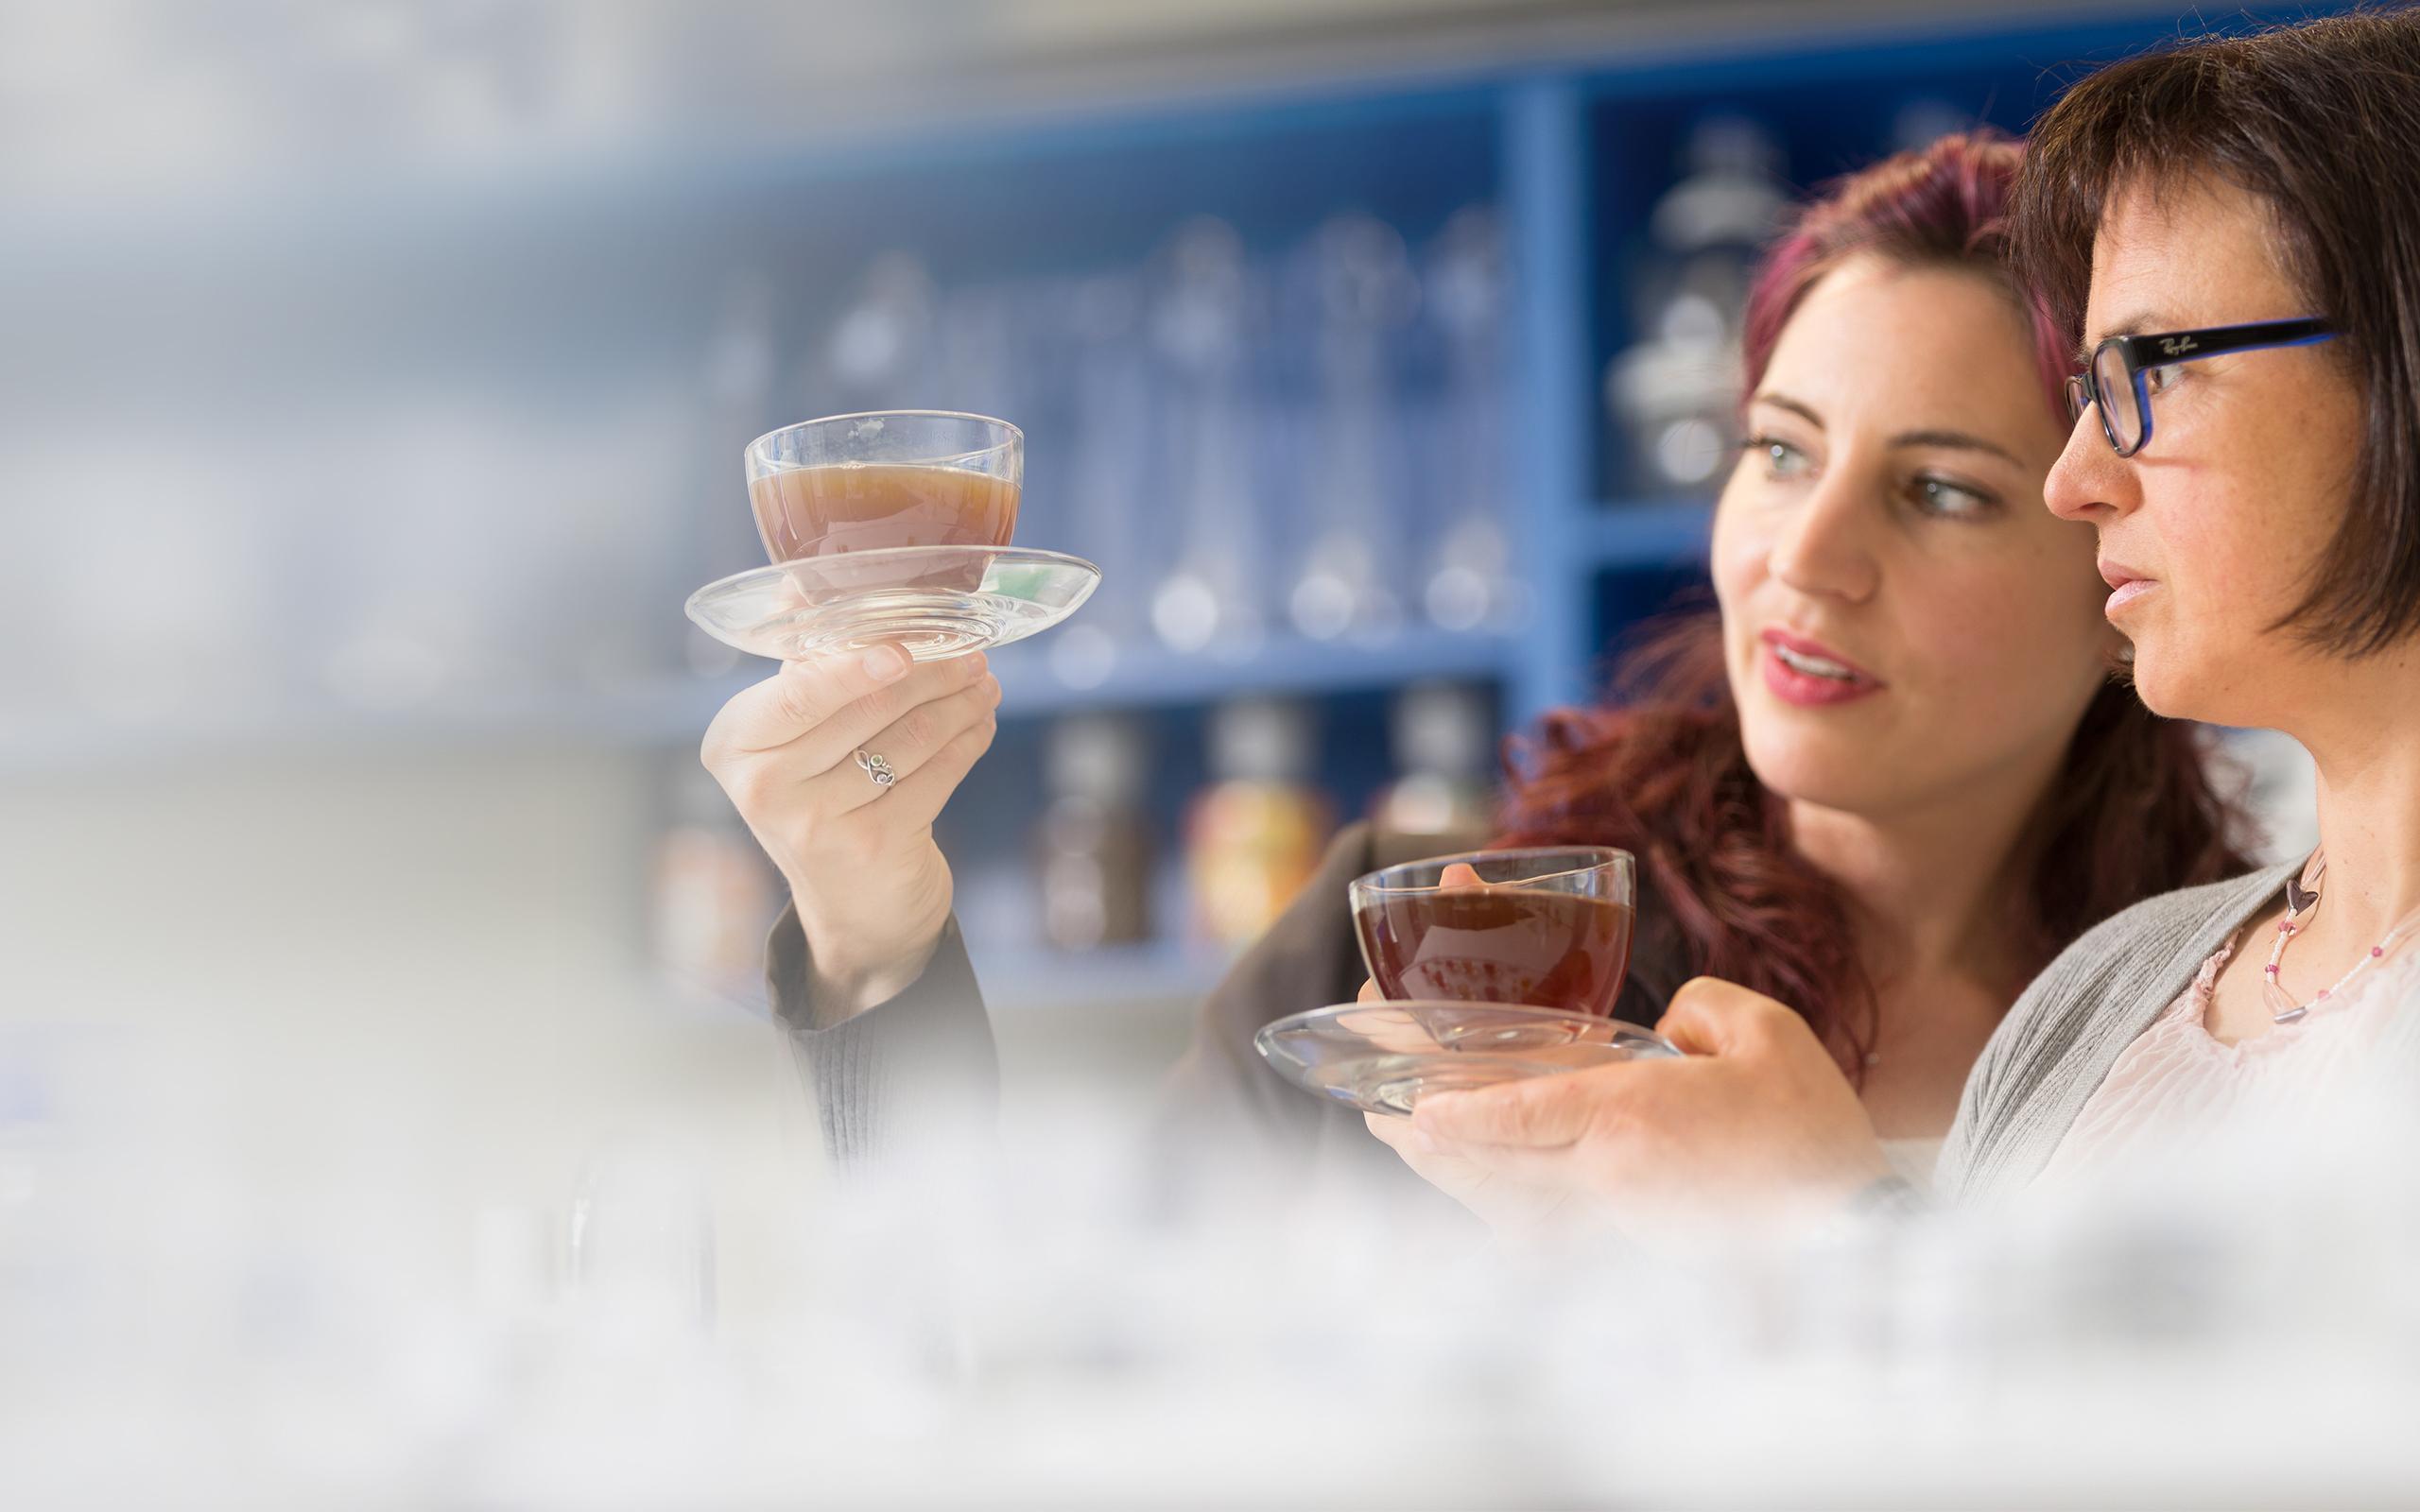 BRITA sensory lab taste testing team